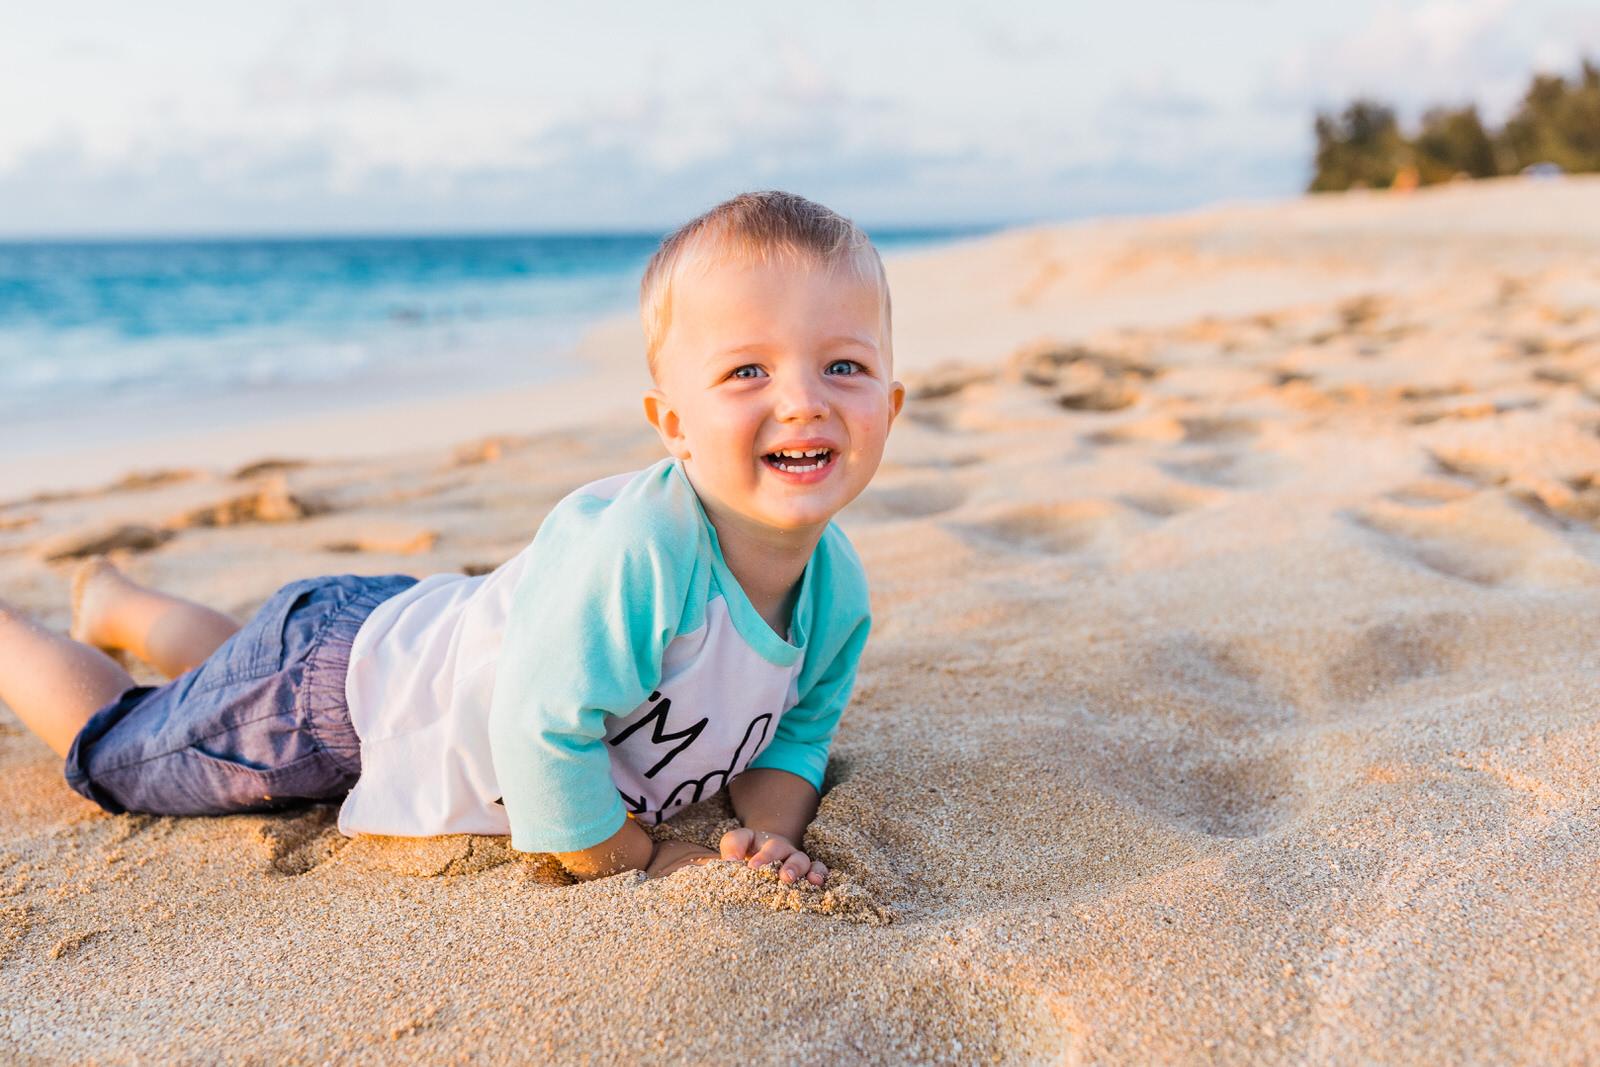 extended-family-big-island-vacation-cousins-grandparents-beach-waikoloa-sunset-hawaii-7234.jpg